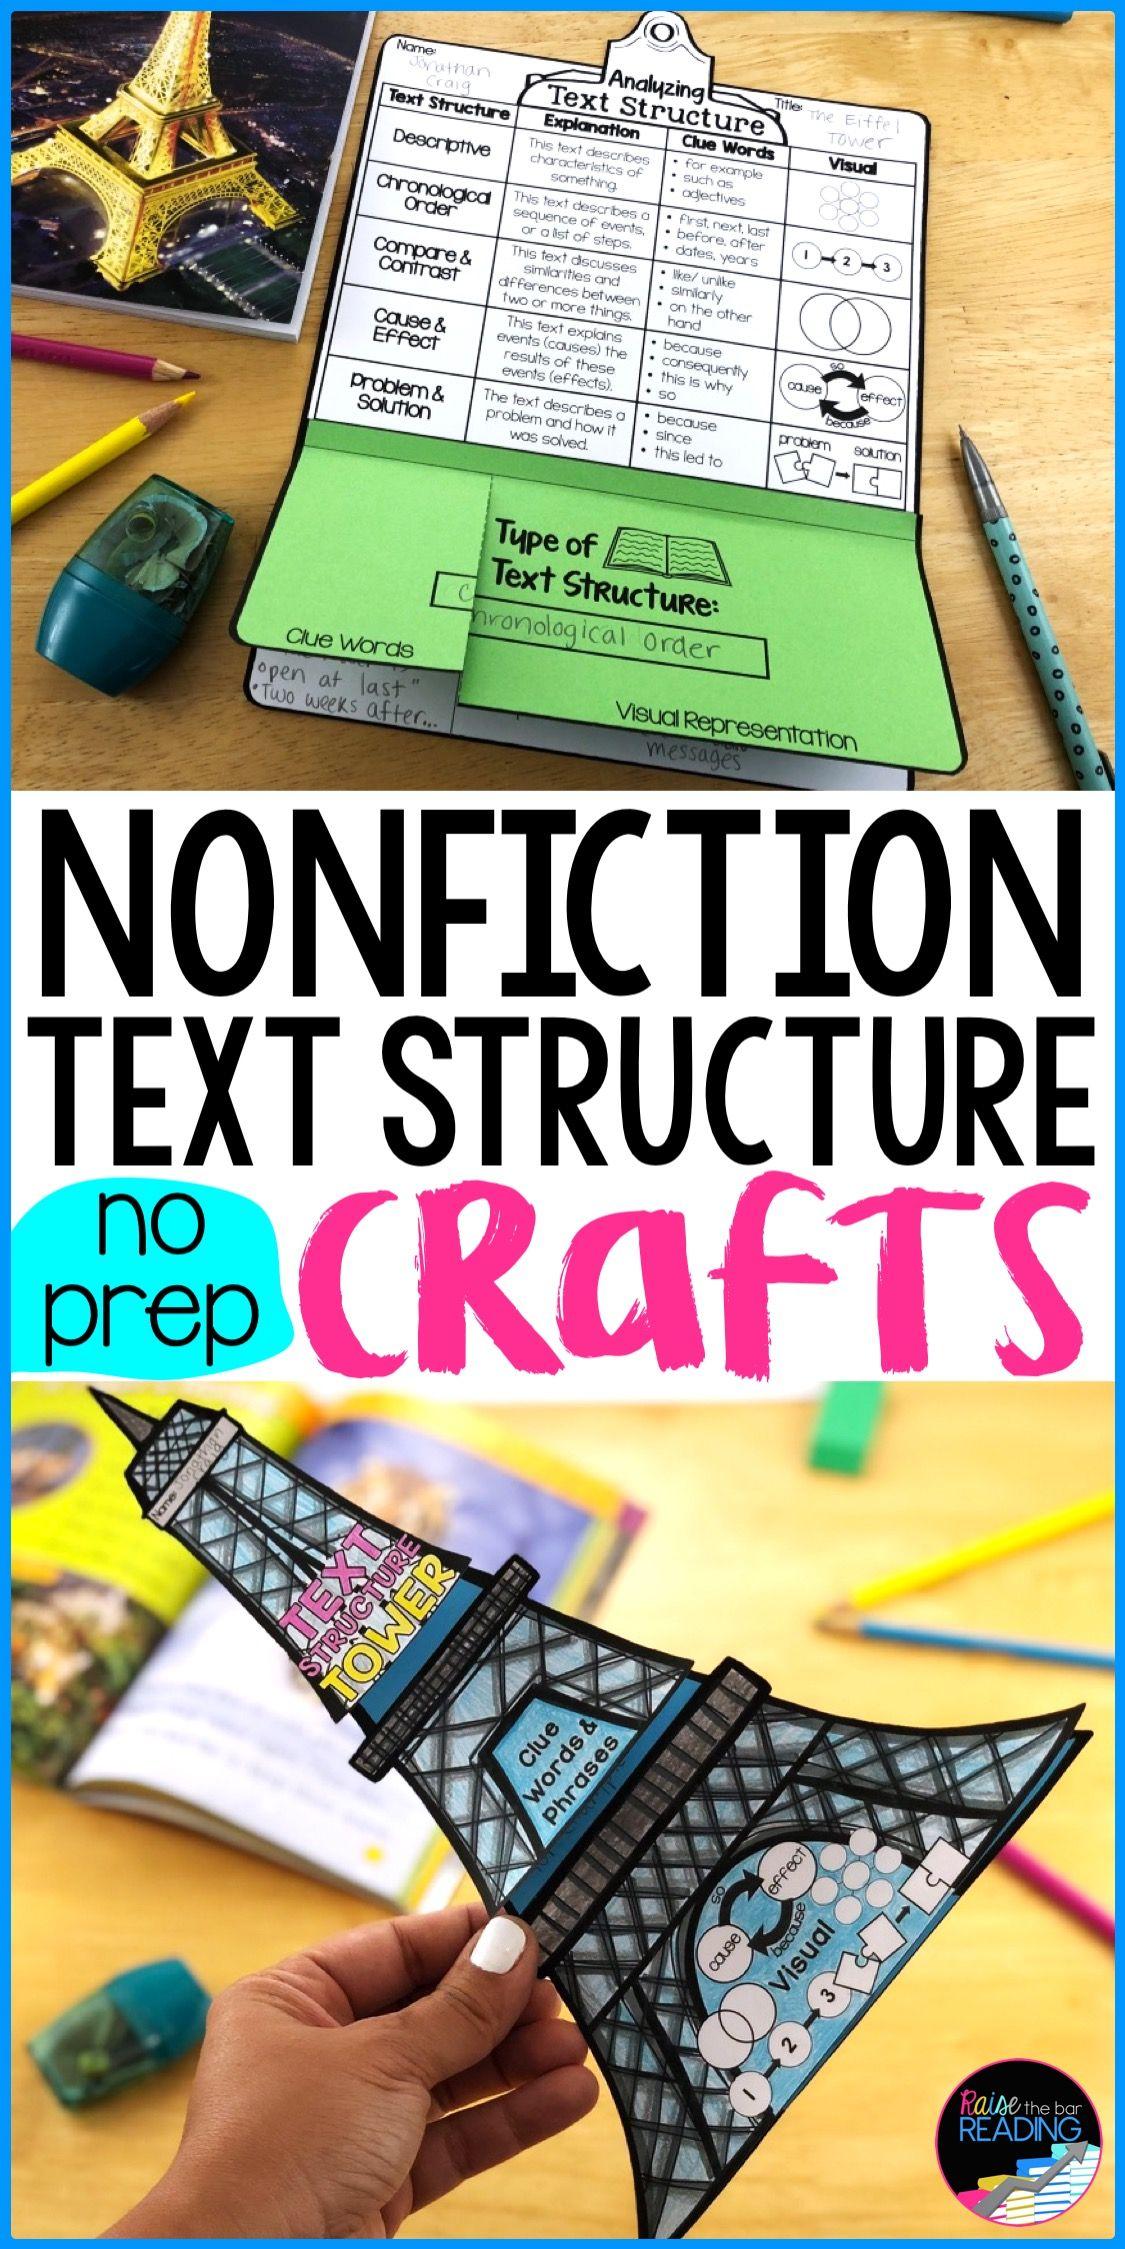 hight resolution of Nonfiction Reading Crafts Set 5: Nonfiction Text Structure Activities    Nonfiction text structure